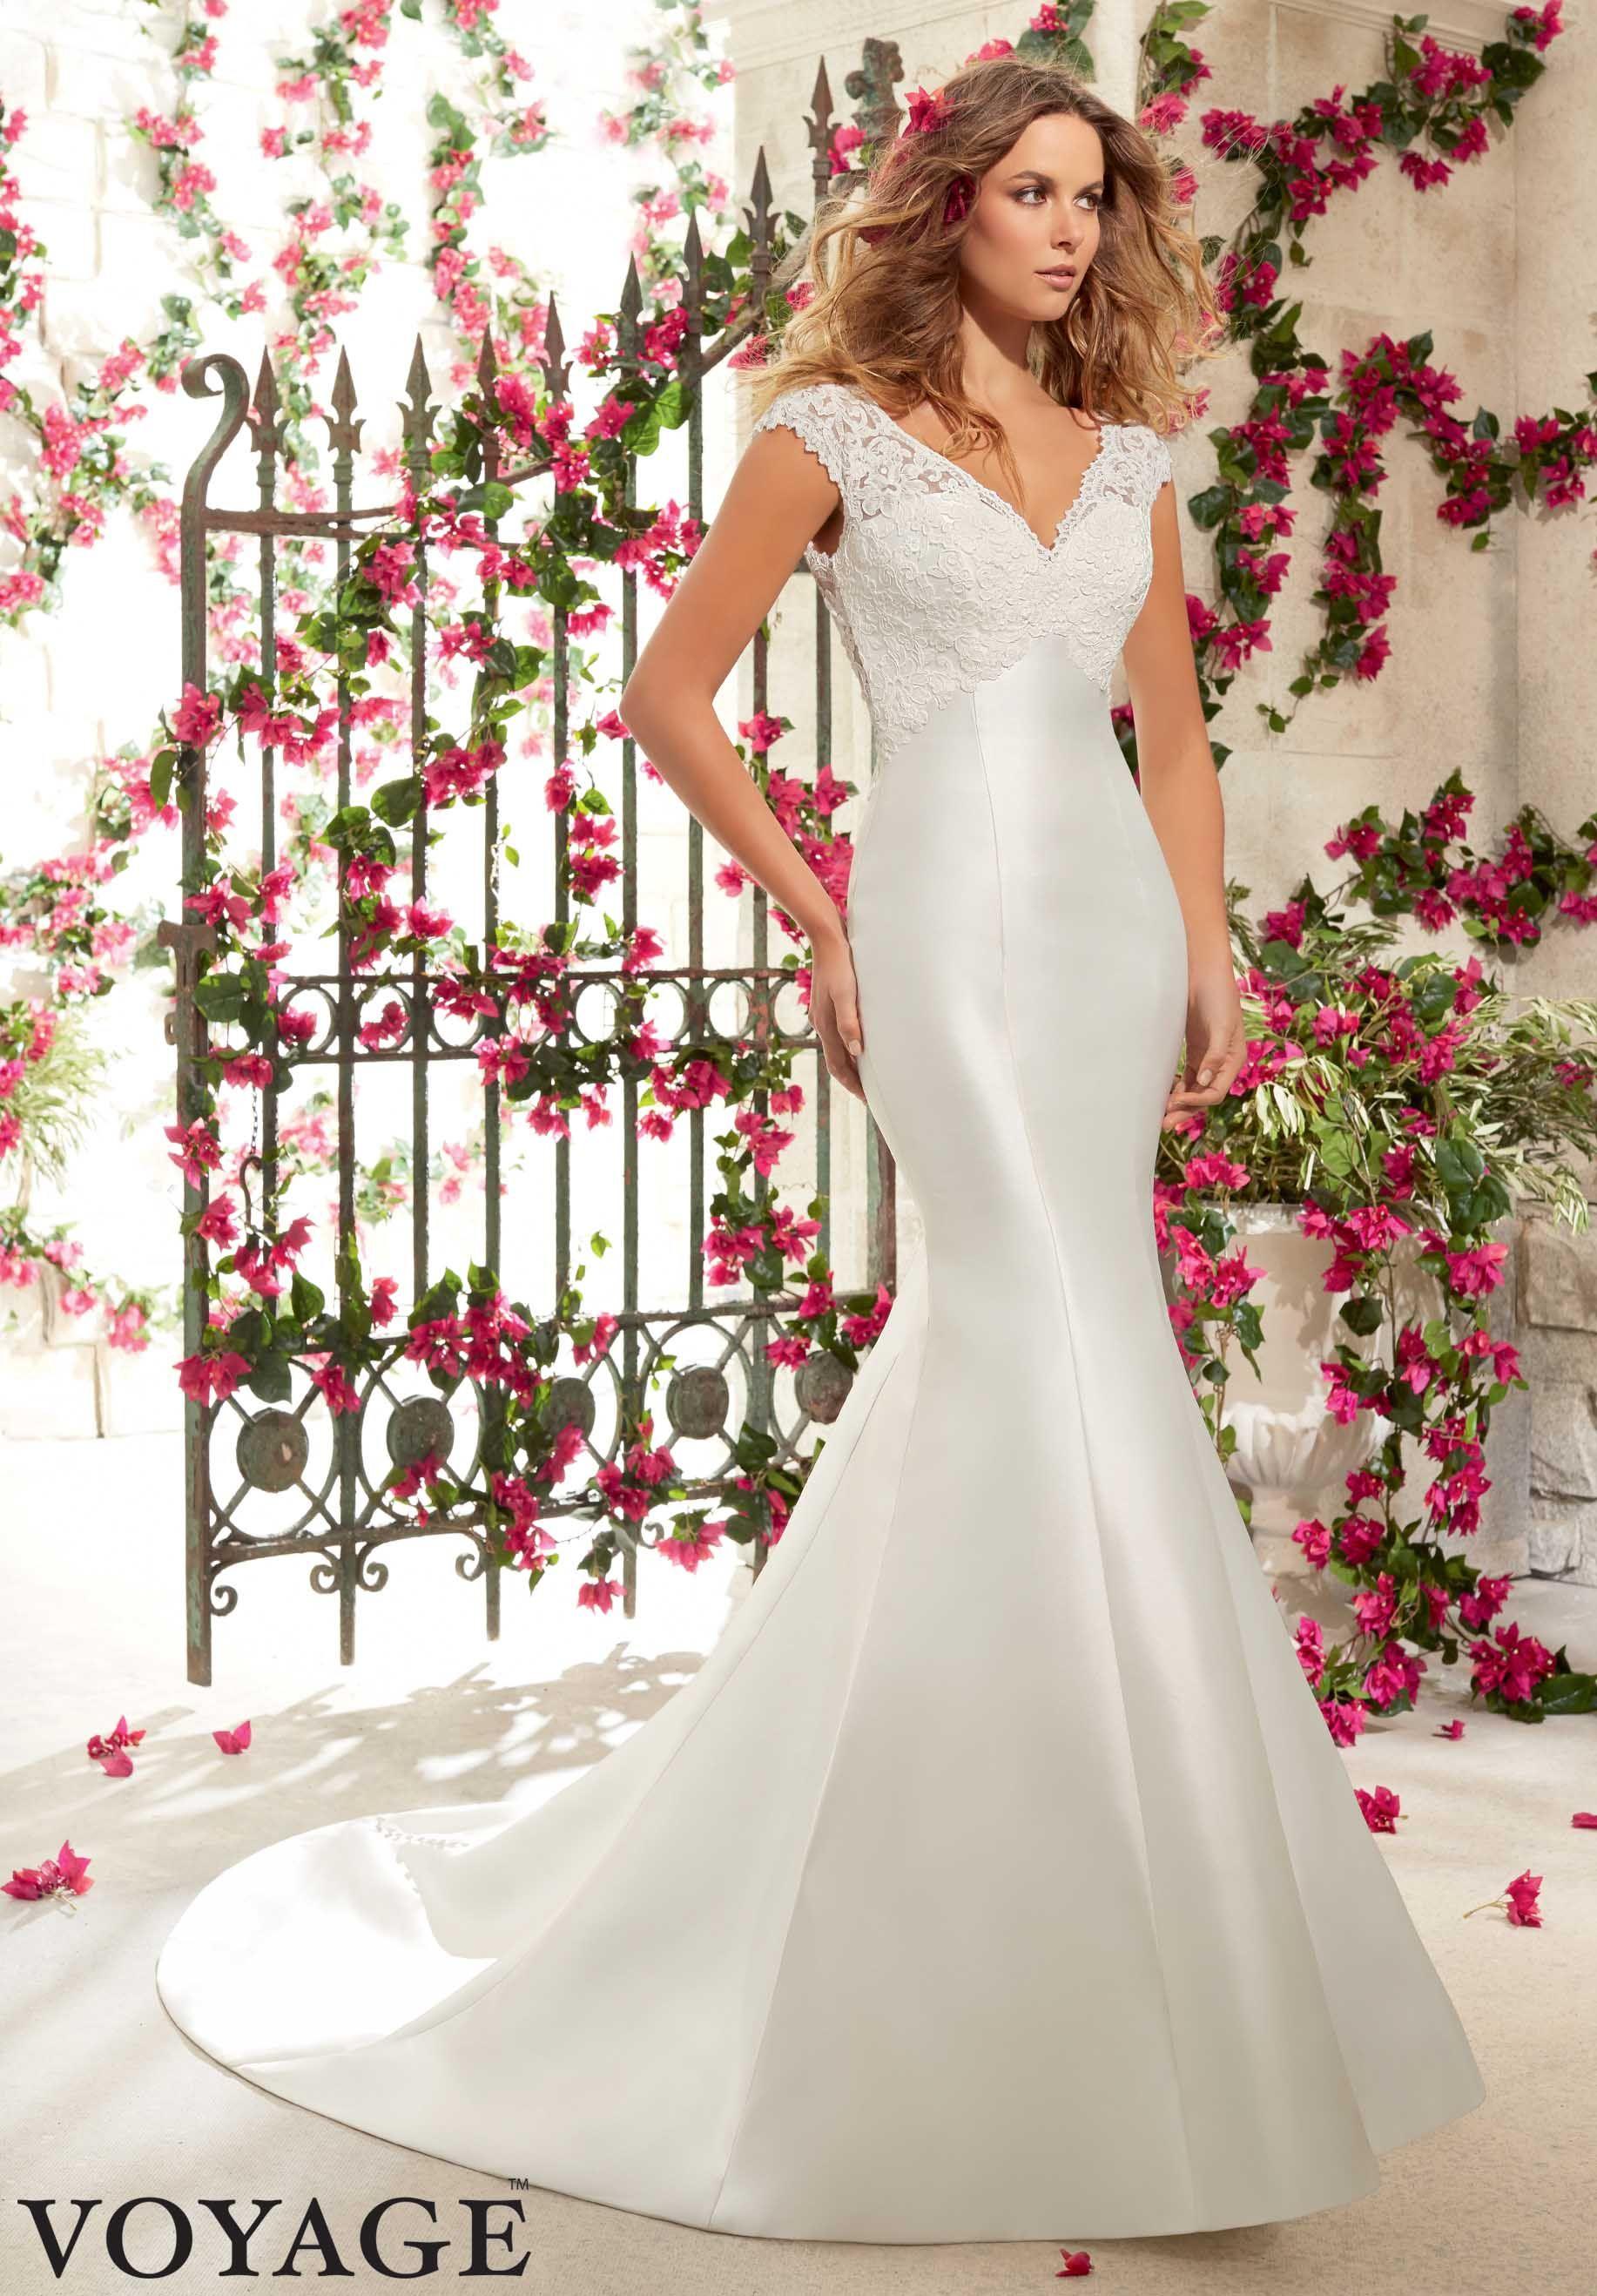 Wedding Bridal Gowns – Designer Voyage – Wedding Dress Style 6793 at ...